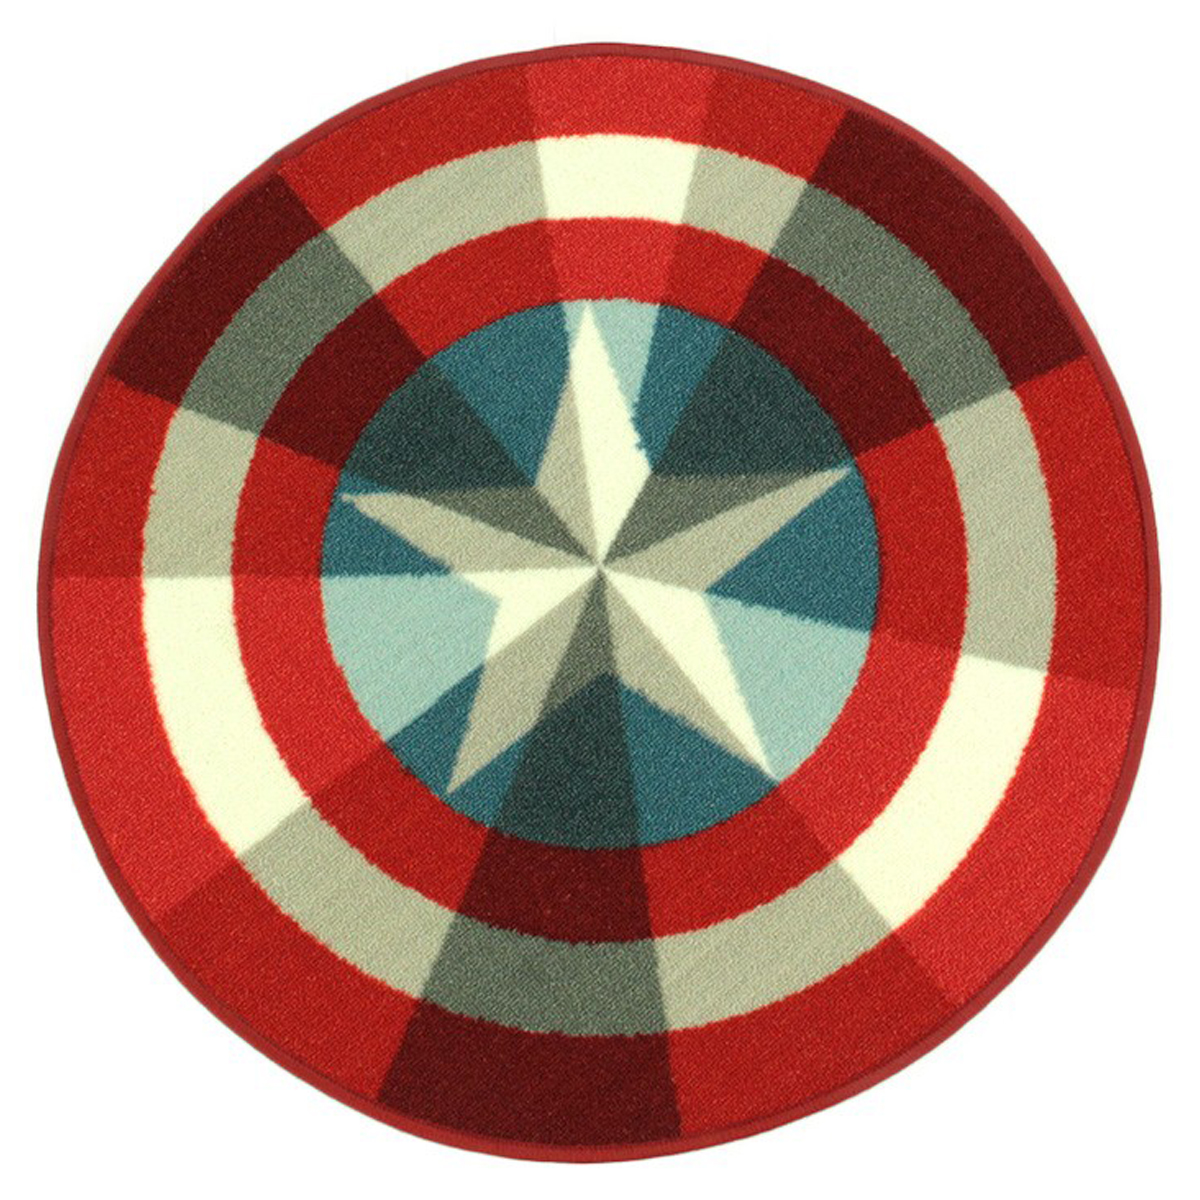 Avengers ctapis bouclier captain america marvel - Bouclier capitaine america ...